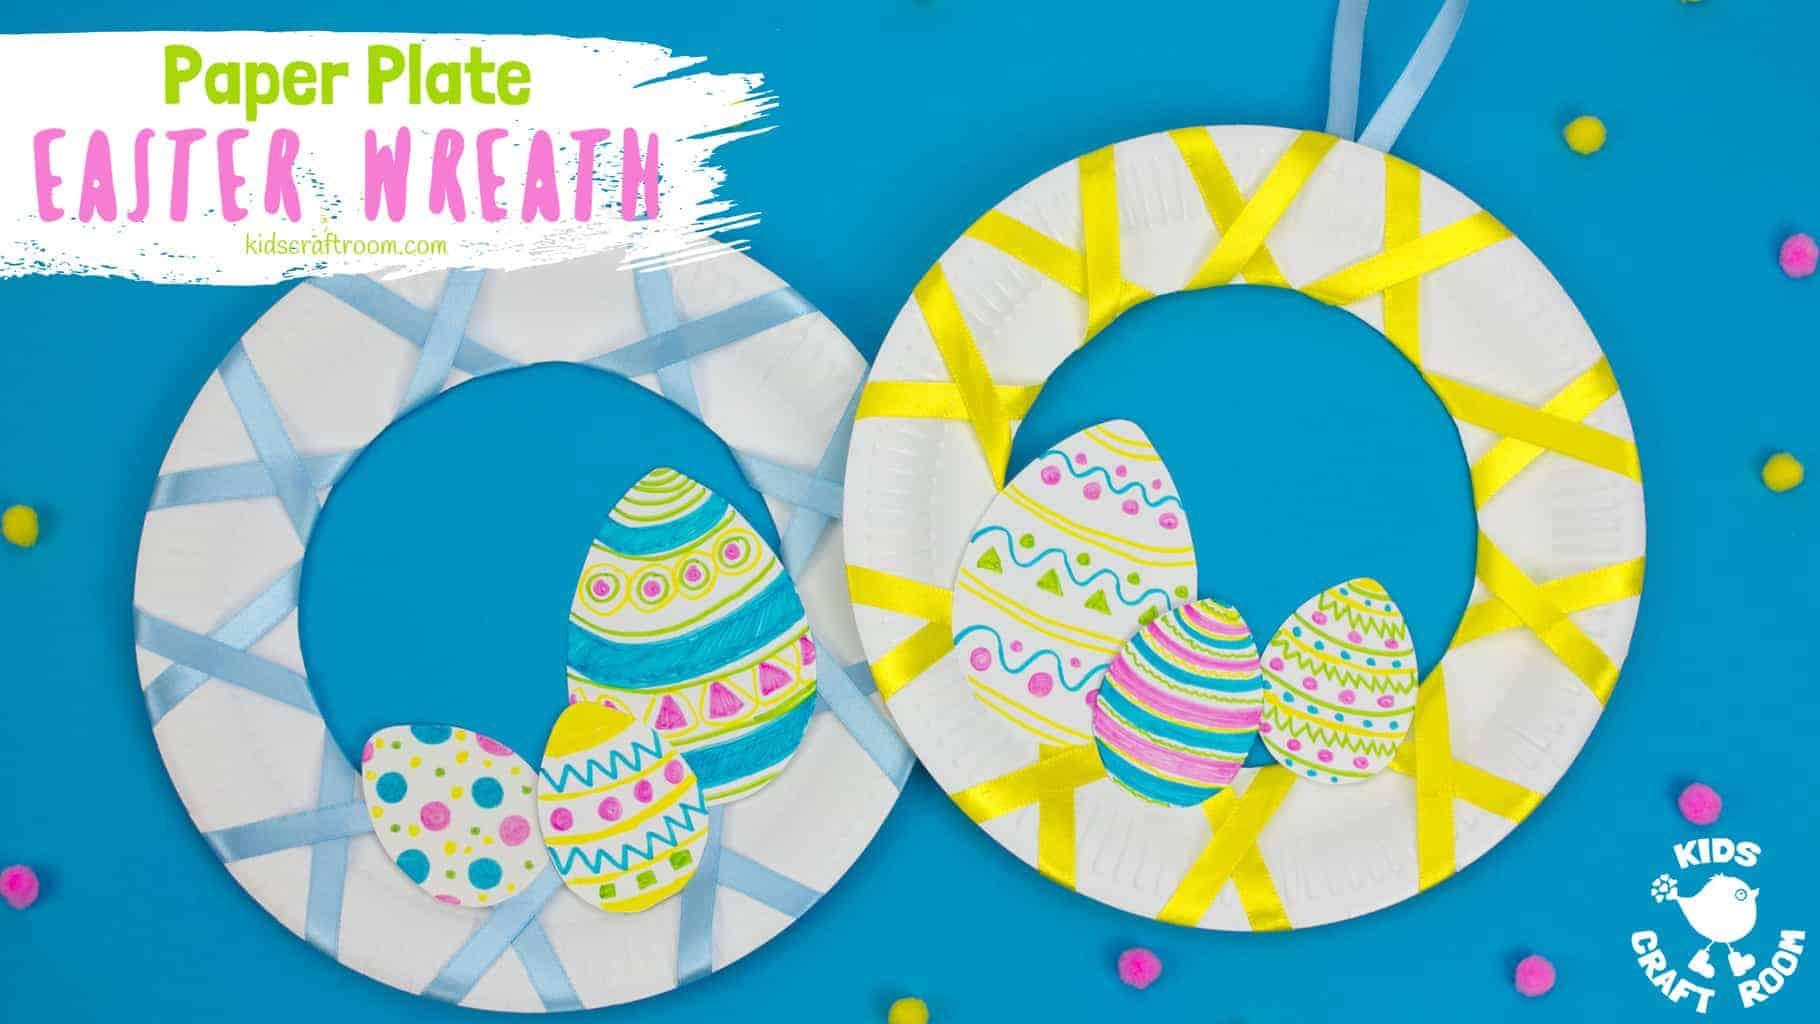 Easy Peasy Paper Plate Easter Wreath Kids Craft Room